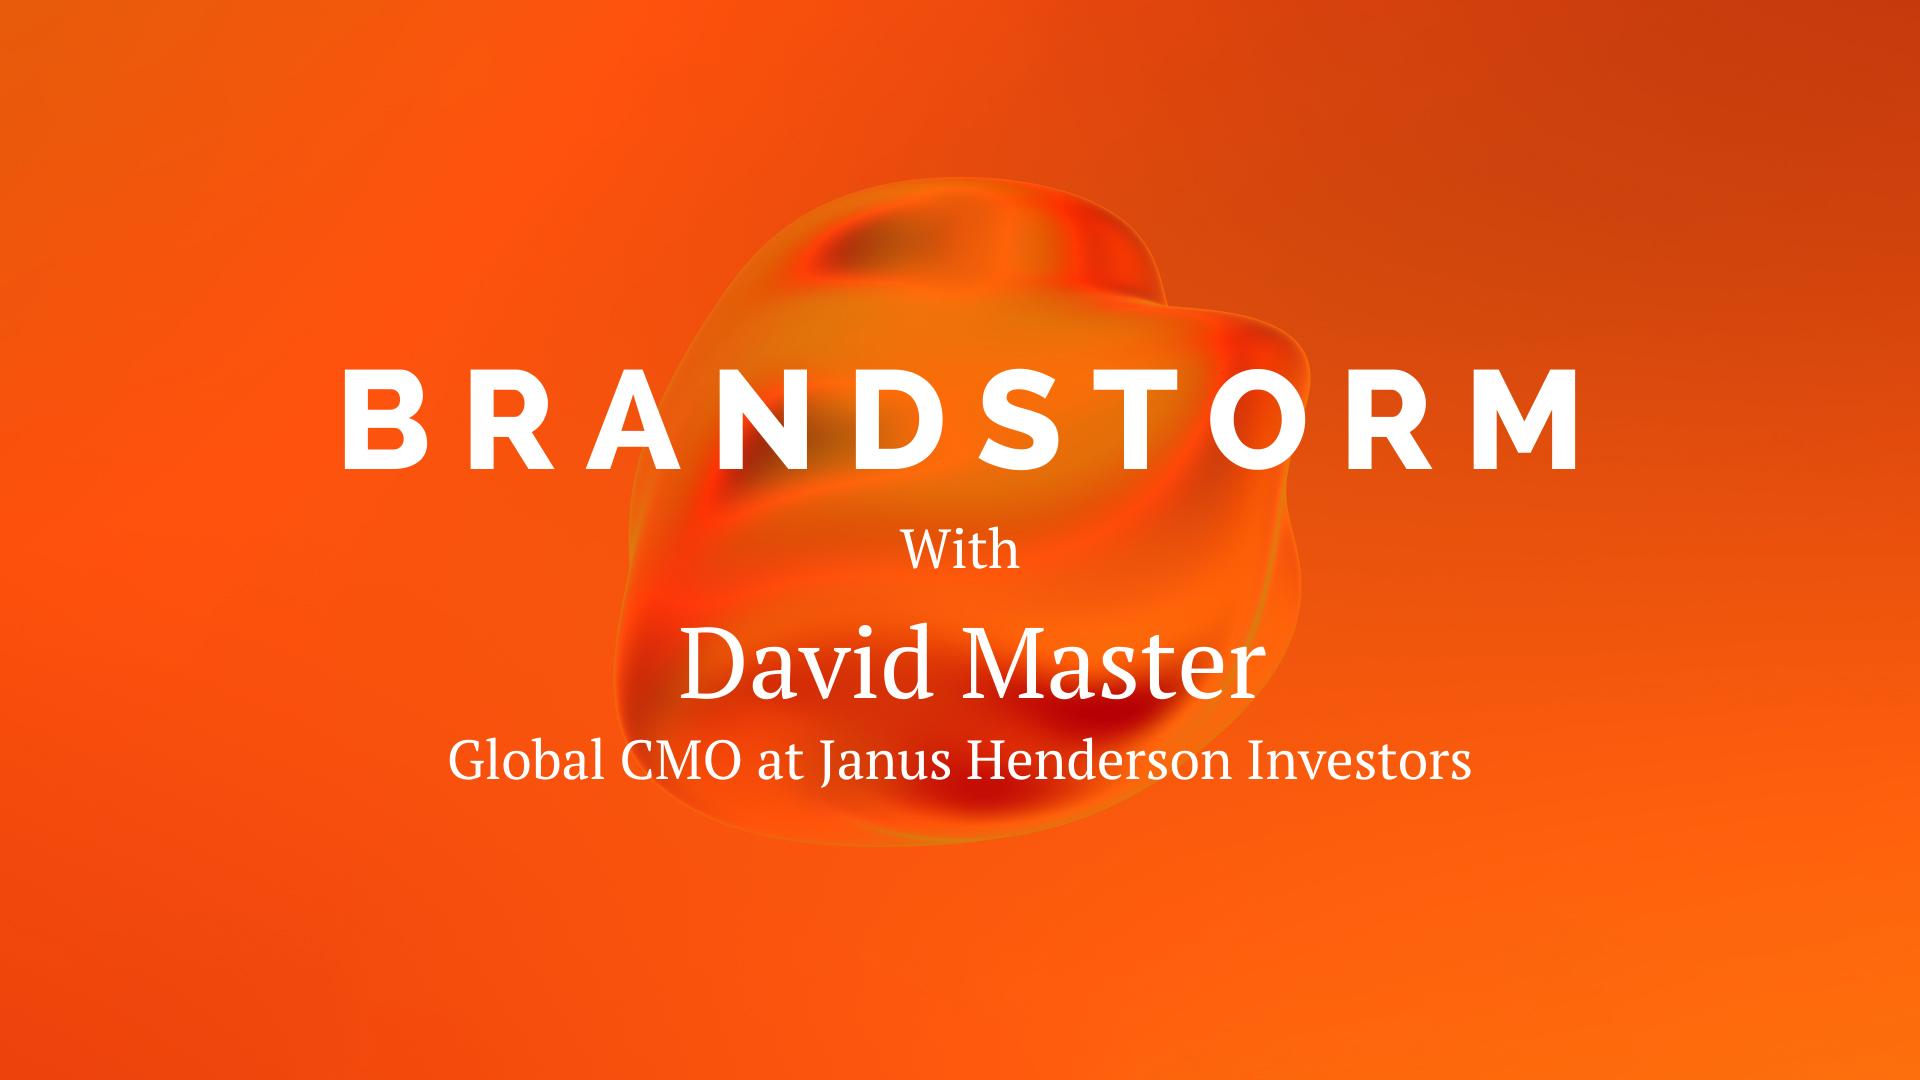 Brandstorm – David Master, Global CMO at Janus Henderson Investors